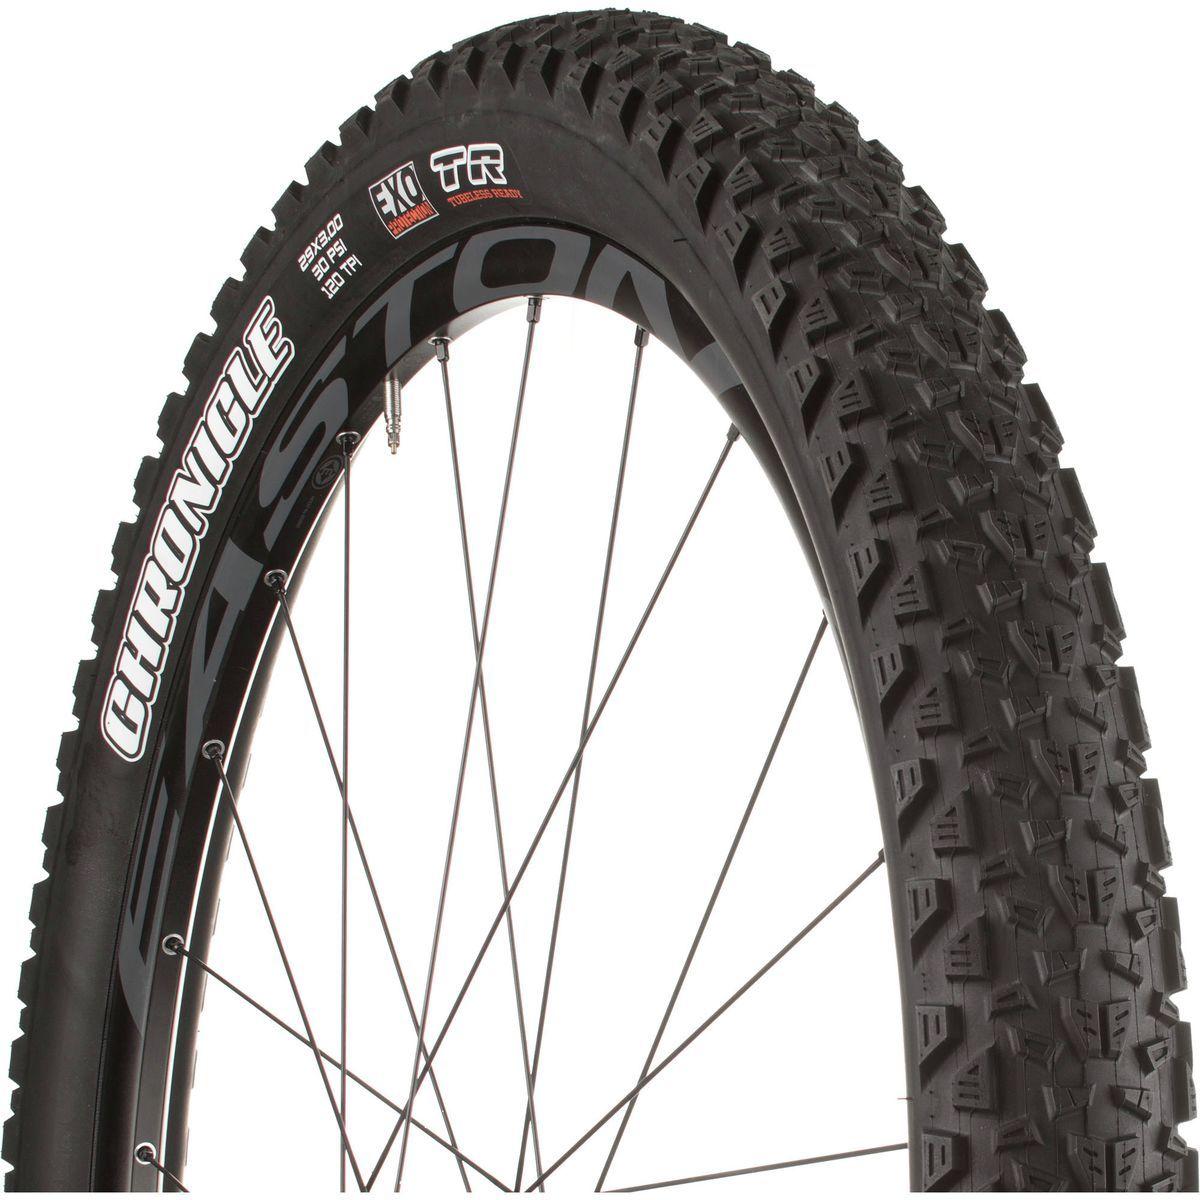 Maxxis Chronicle Exo Tr Tire 29 Plus Mountain Bike Tires Bike